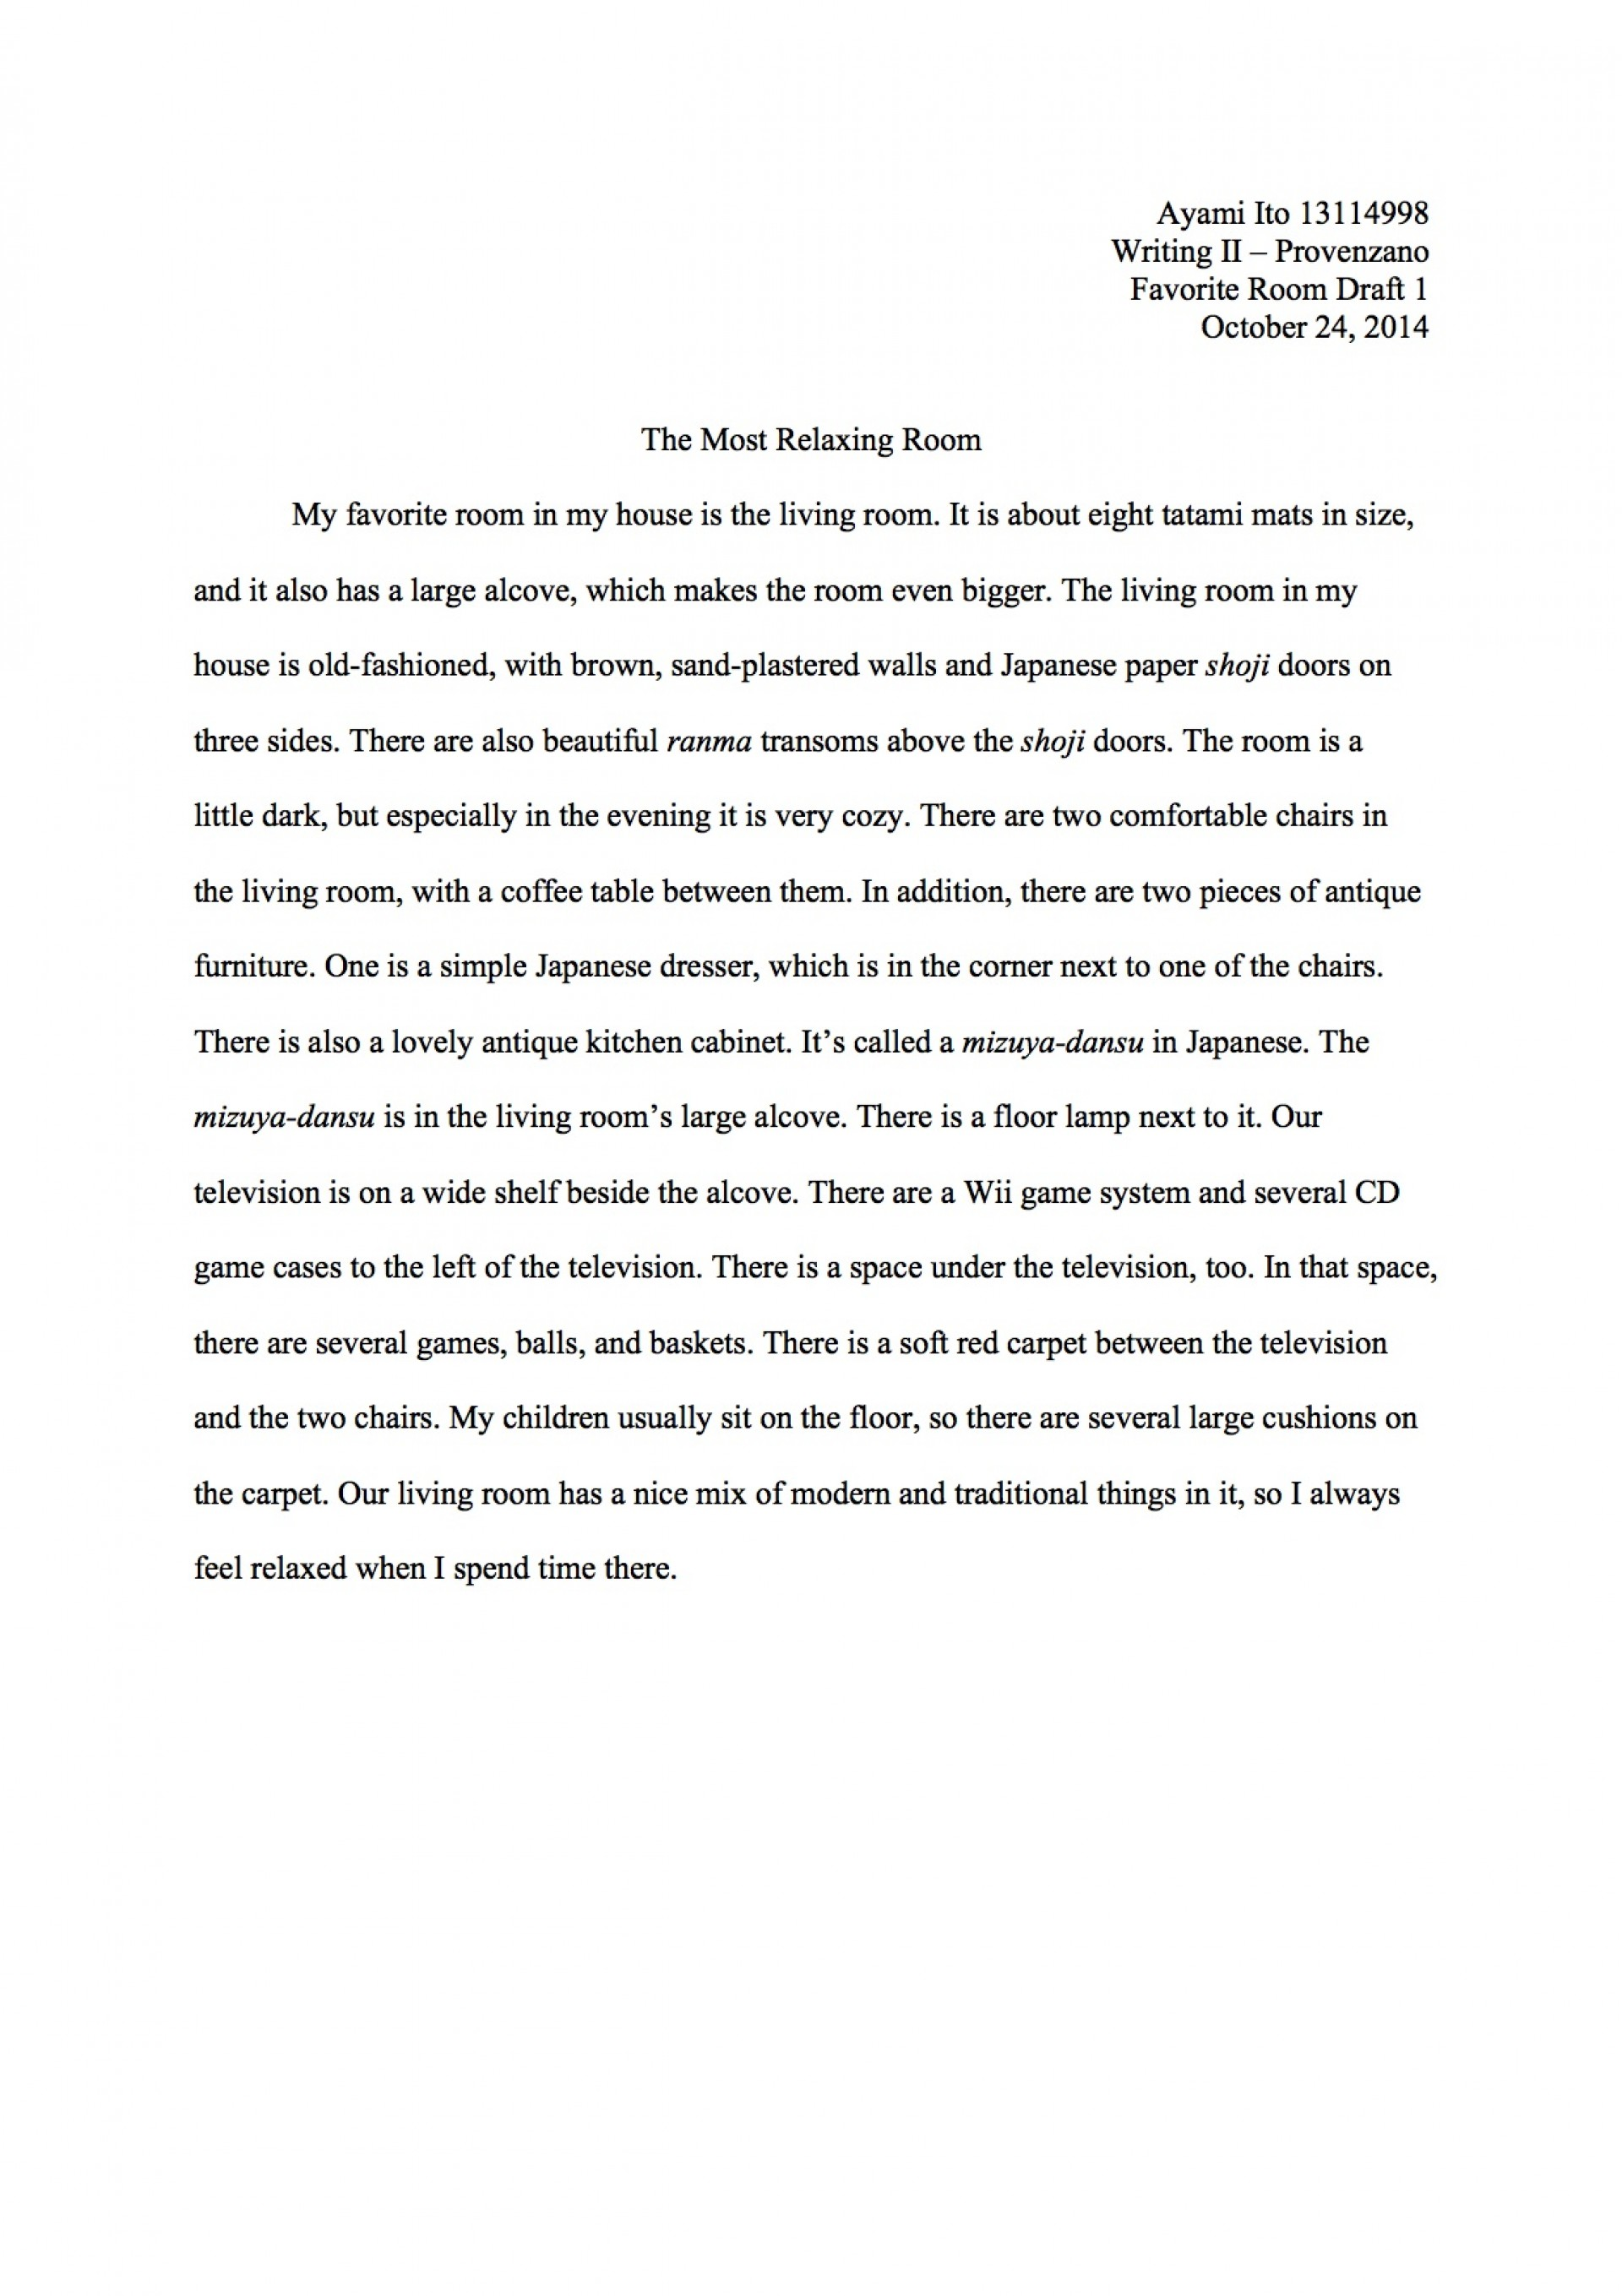 my dream bedroom descriptive essay